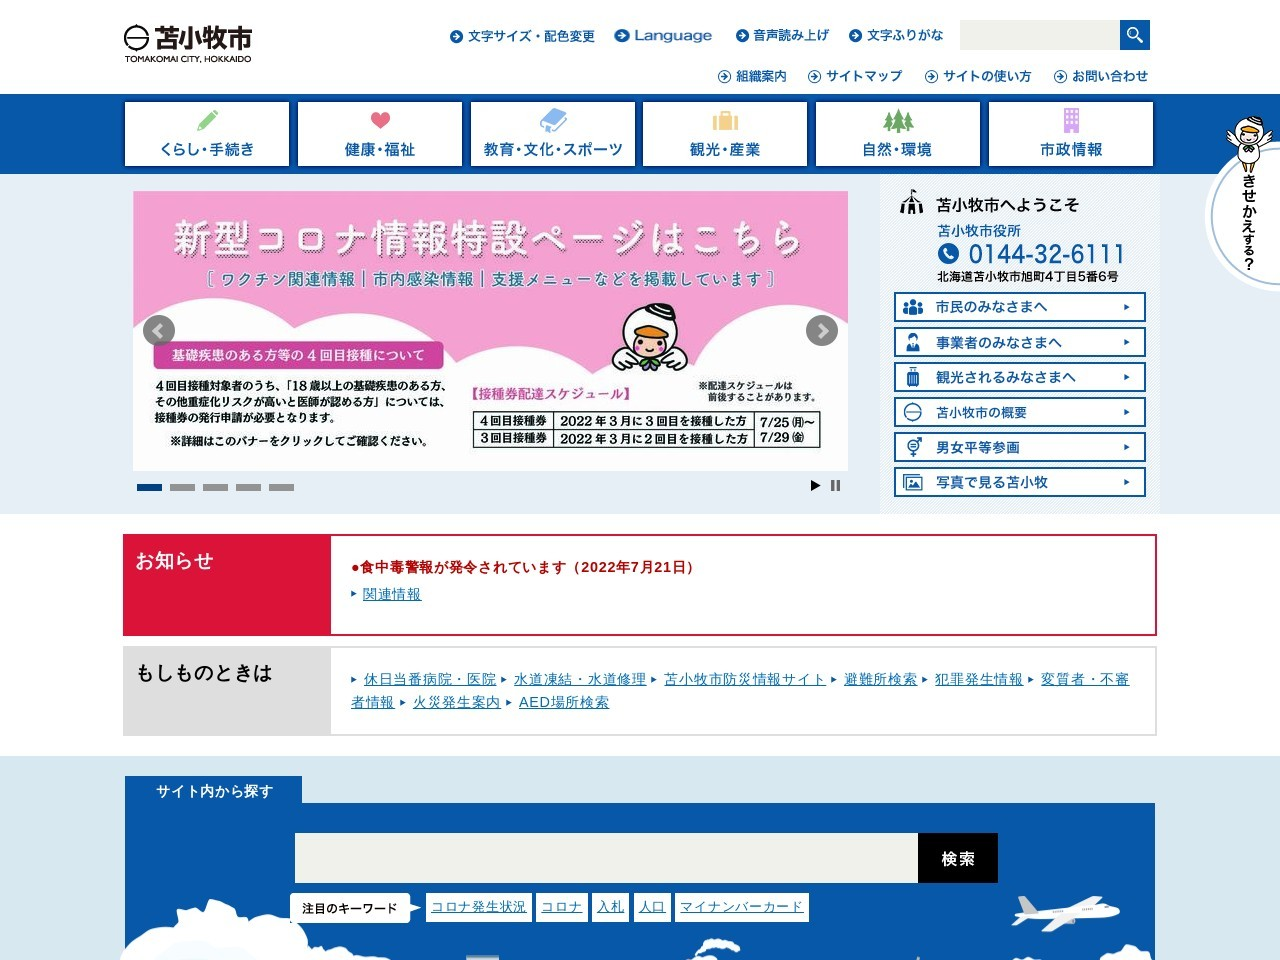 http://www.city.tomakomai.hokkaido.jp/kurashi/jogesuido/sokatsu/ippankyoso/kation.html